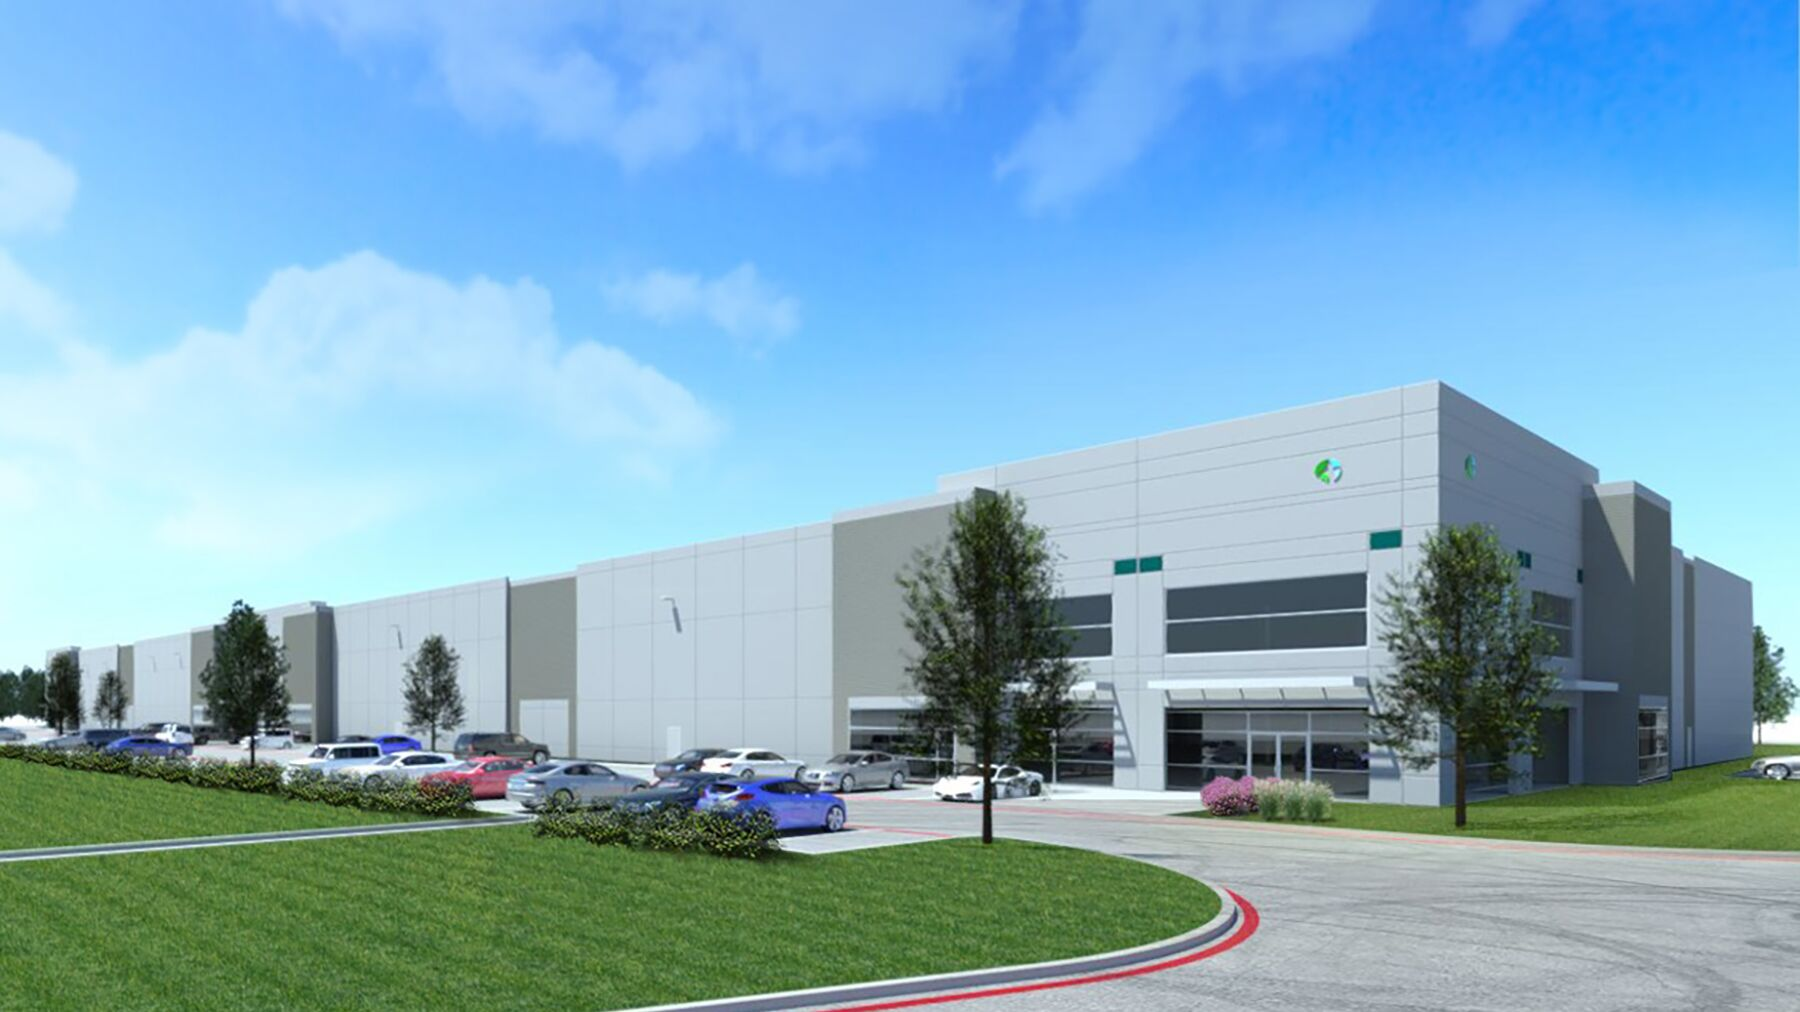 DPM-Prologis-Lewisville-2-DAL06302-West-Vista-Ridge-Mall-Drive_Rendering.jpg